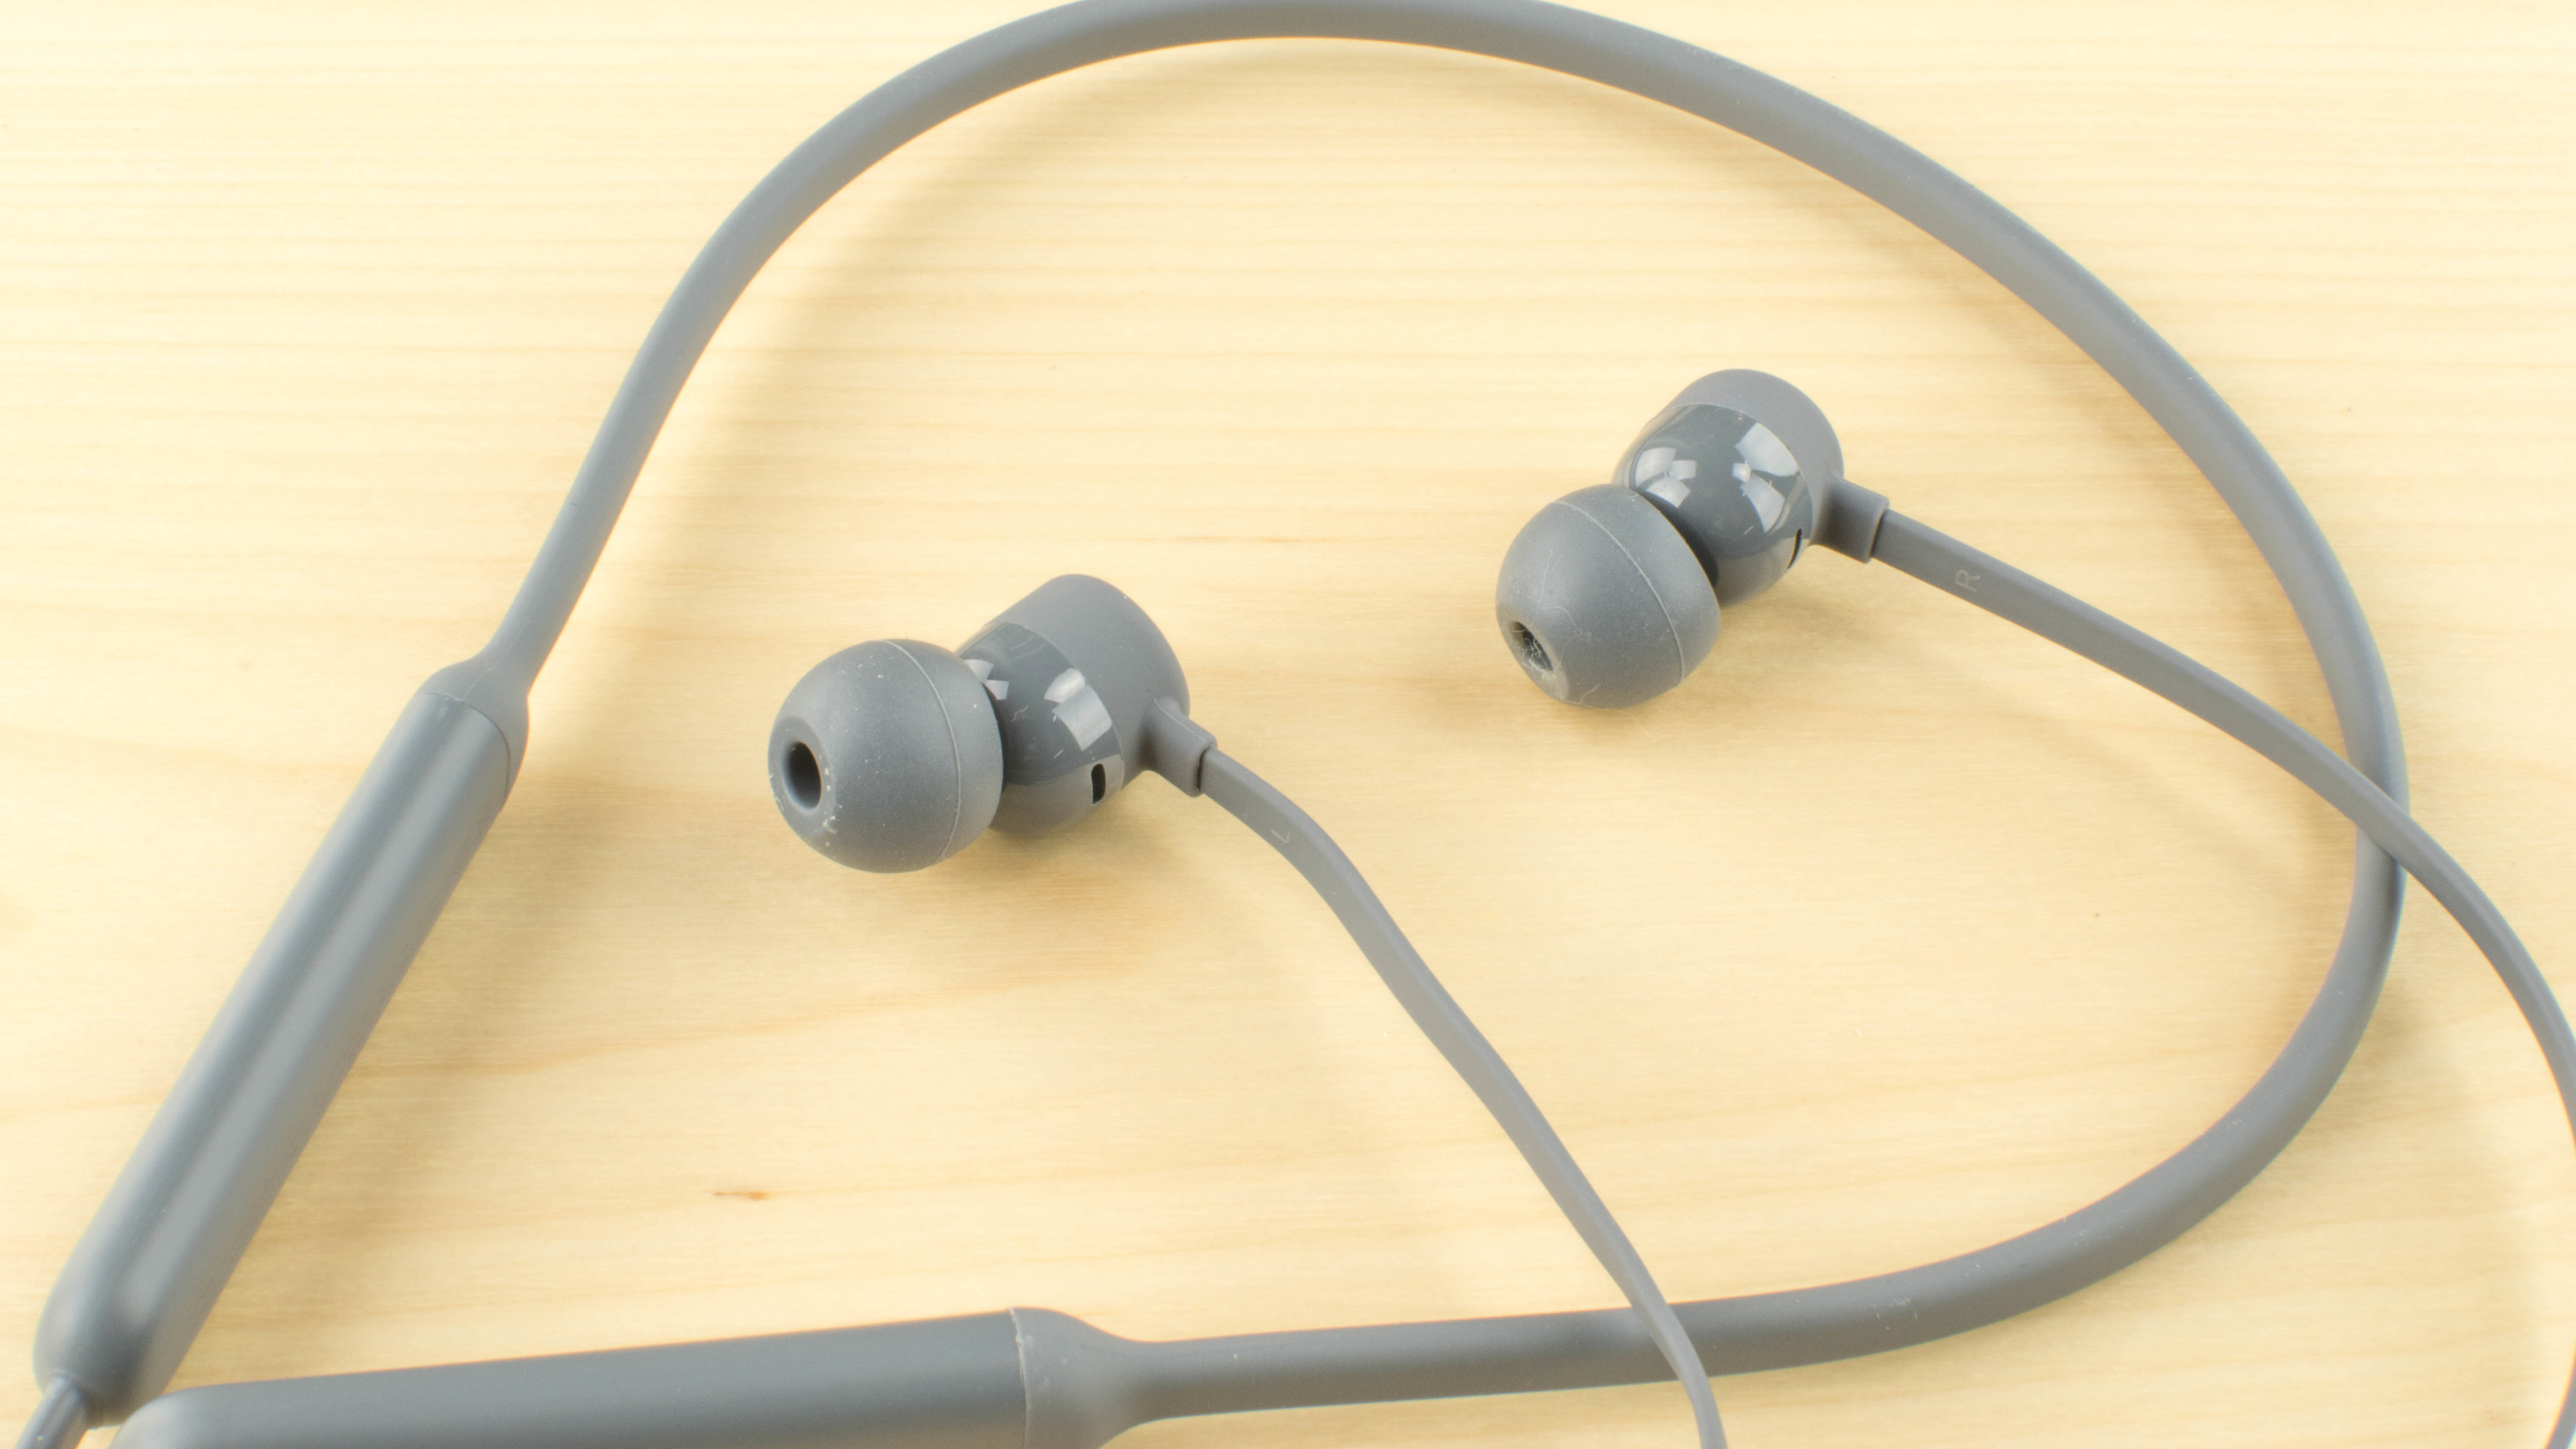 Rewiring Earbuds Ipod Wire Data Schema Headphone Wiring Color Diagram Beats And Schematics Apple Skullcandy